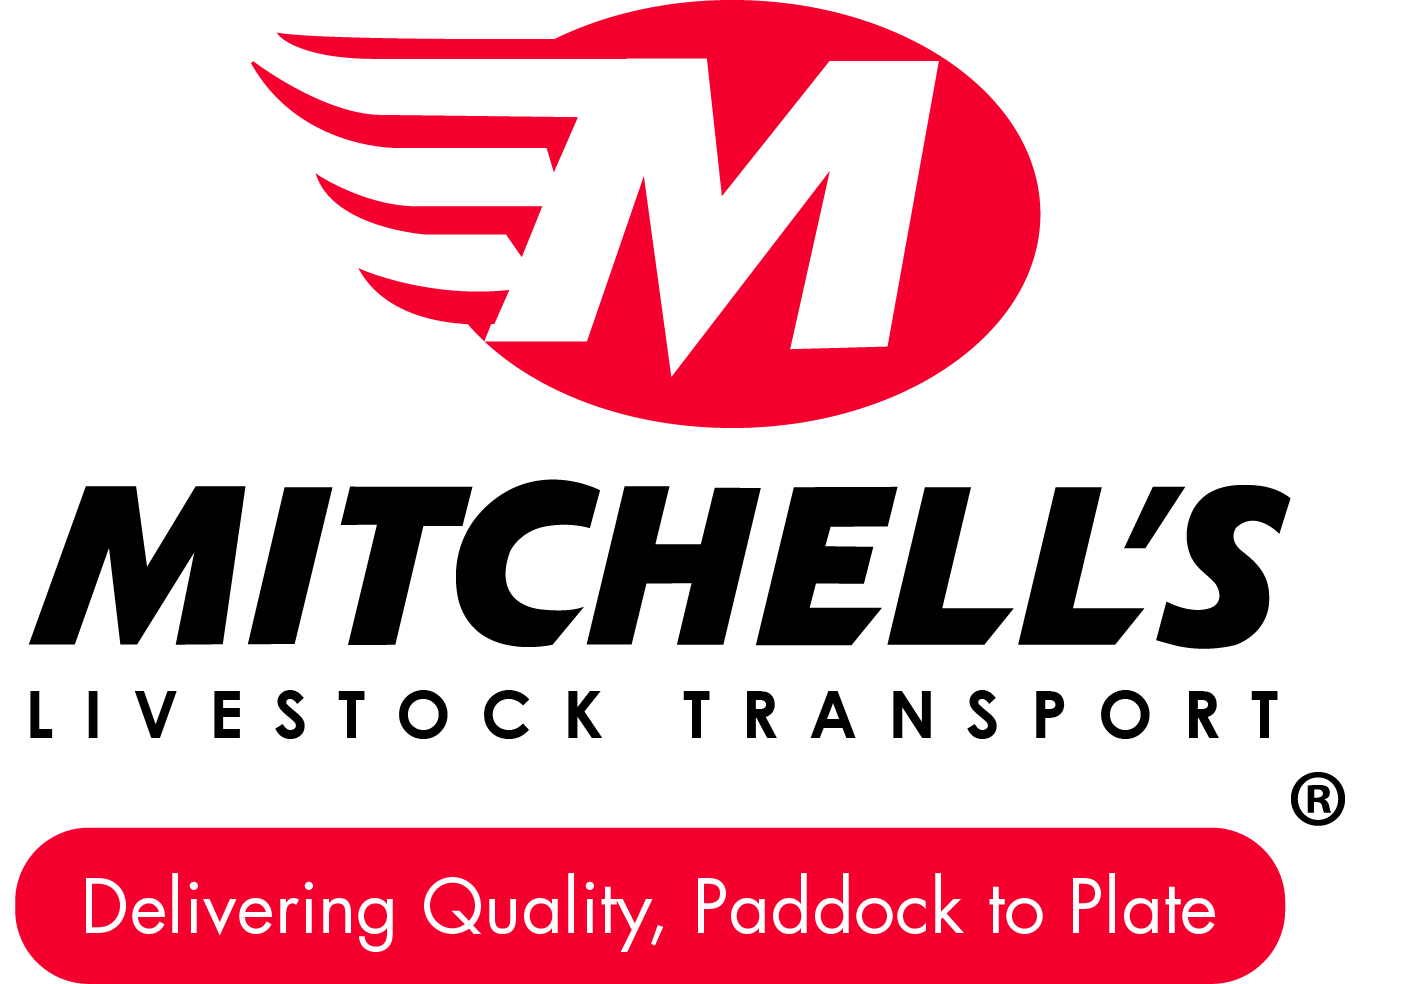 Mitchell's Transport